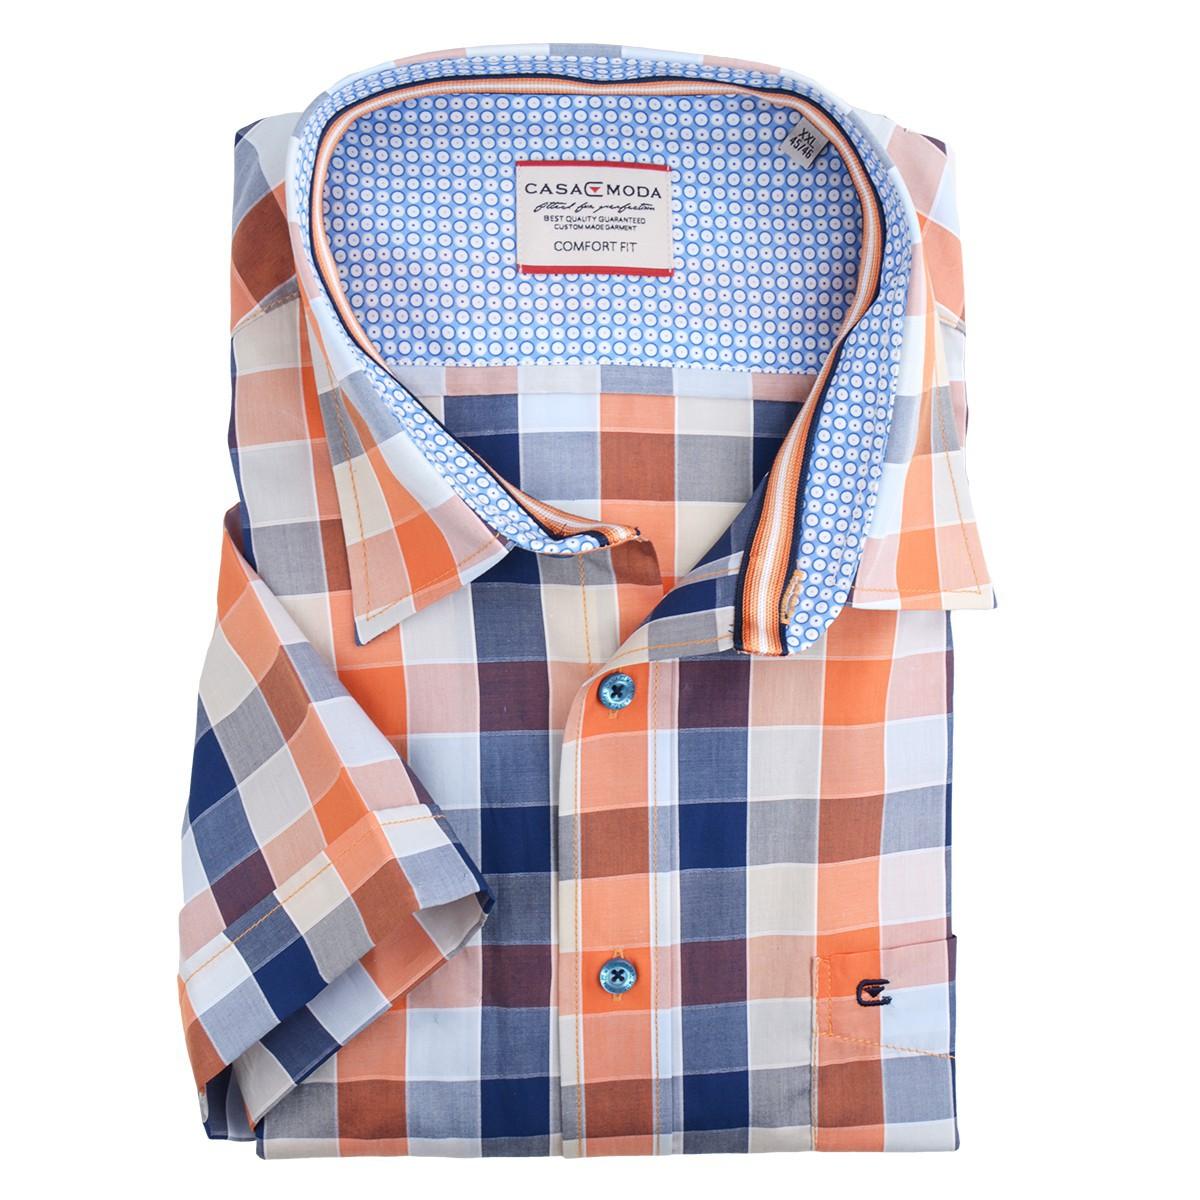 outlet store 74a5c 89d93 XXL Casa Moda kariertes kurzarm Hemd orange-blau-weiß